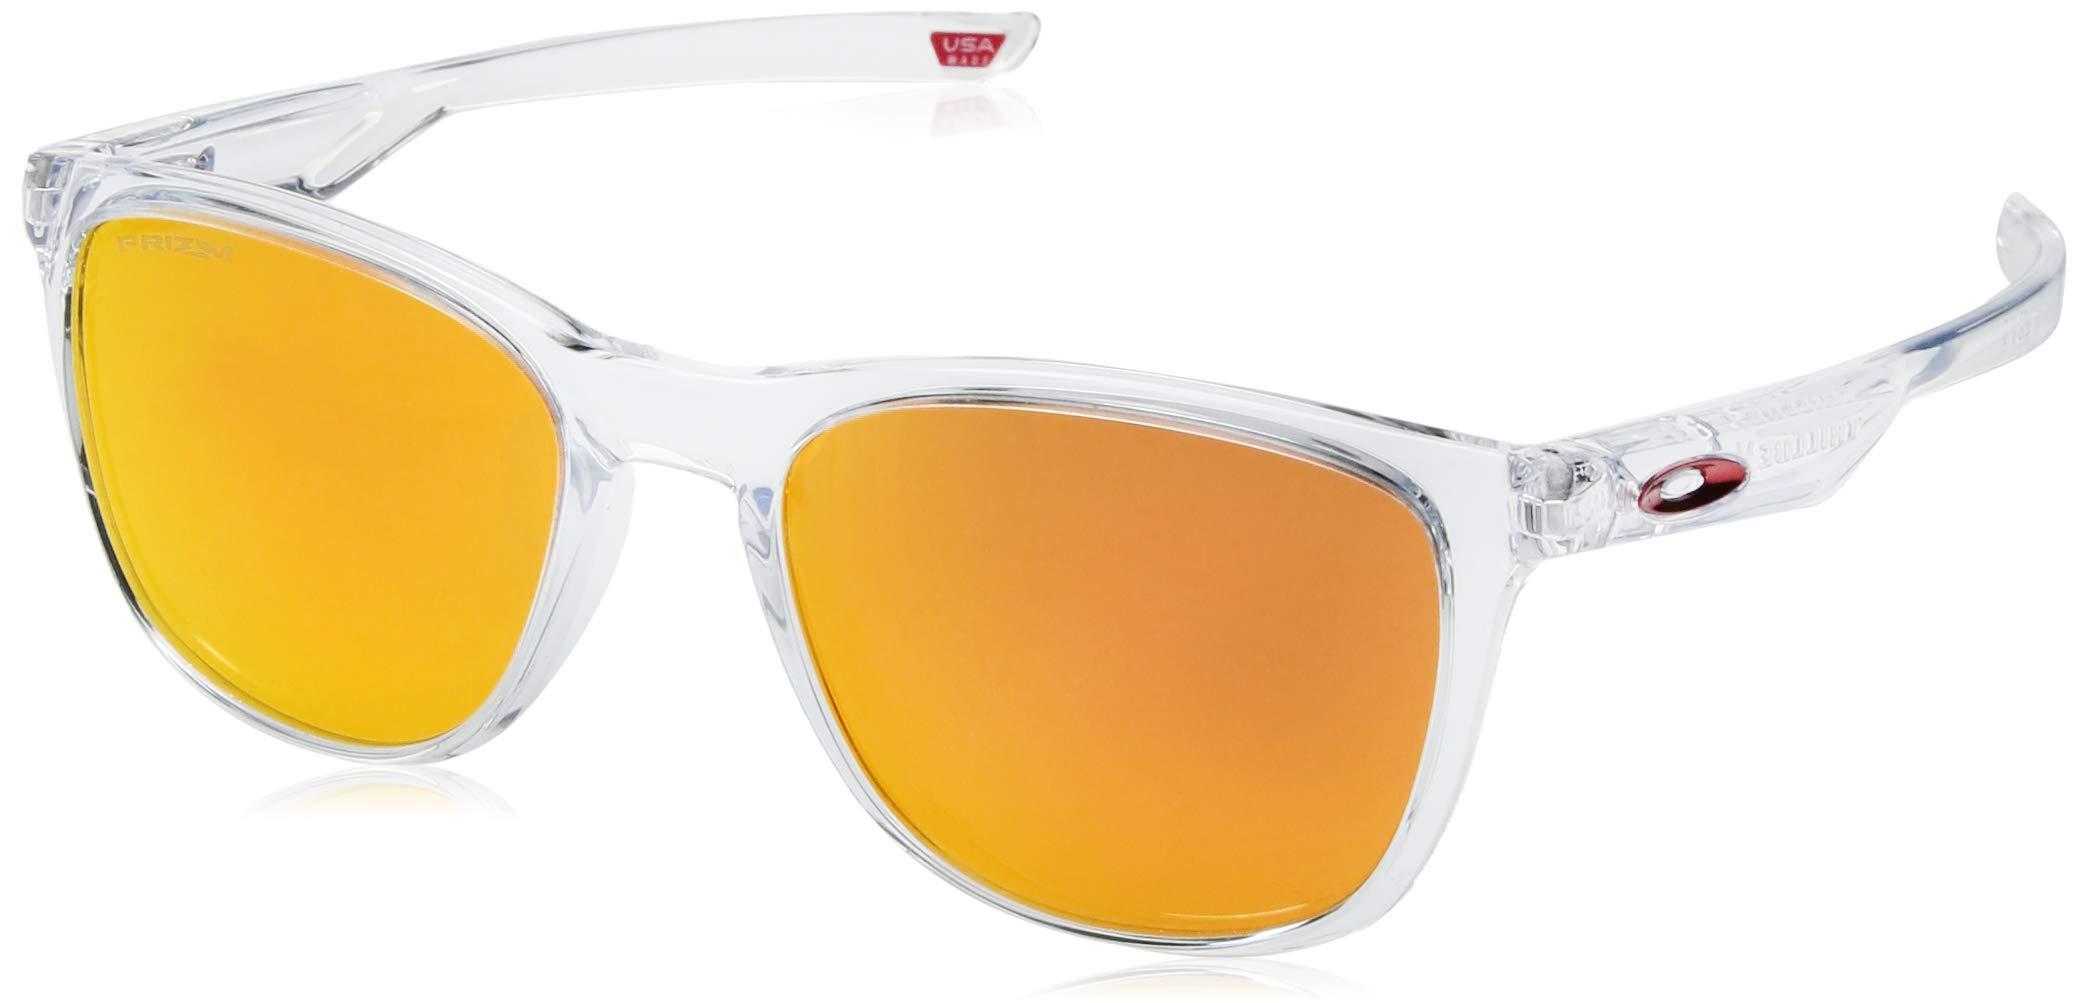 Oakley Men's Trillbe X Iridium Rectangular Sunglasses Polished Clear 52.0 mm